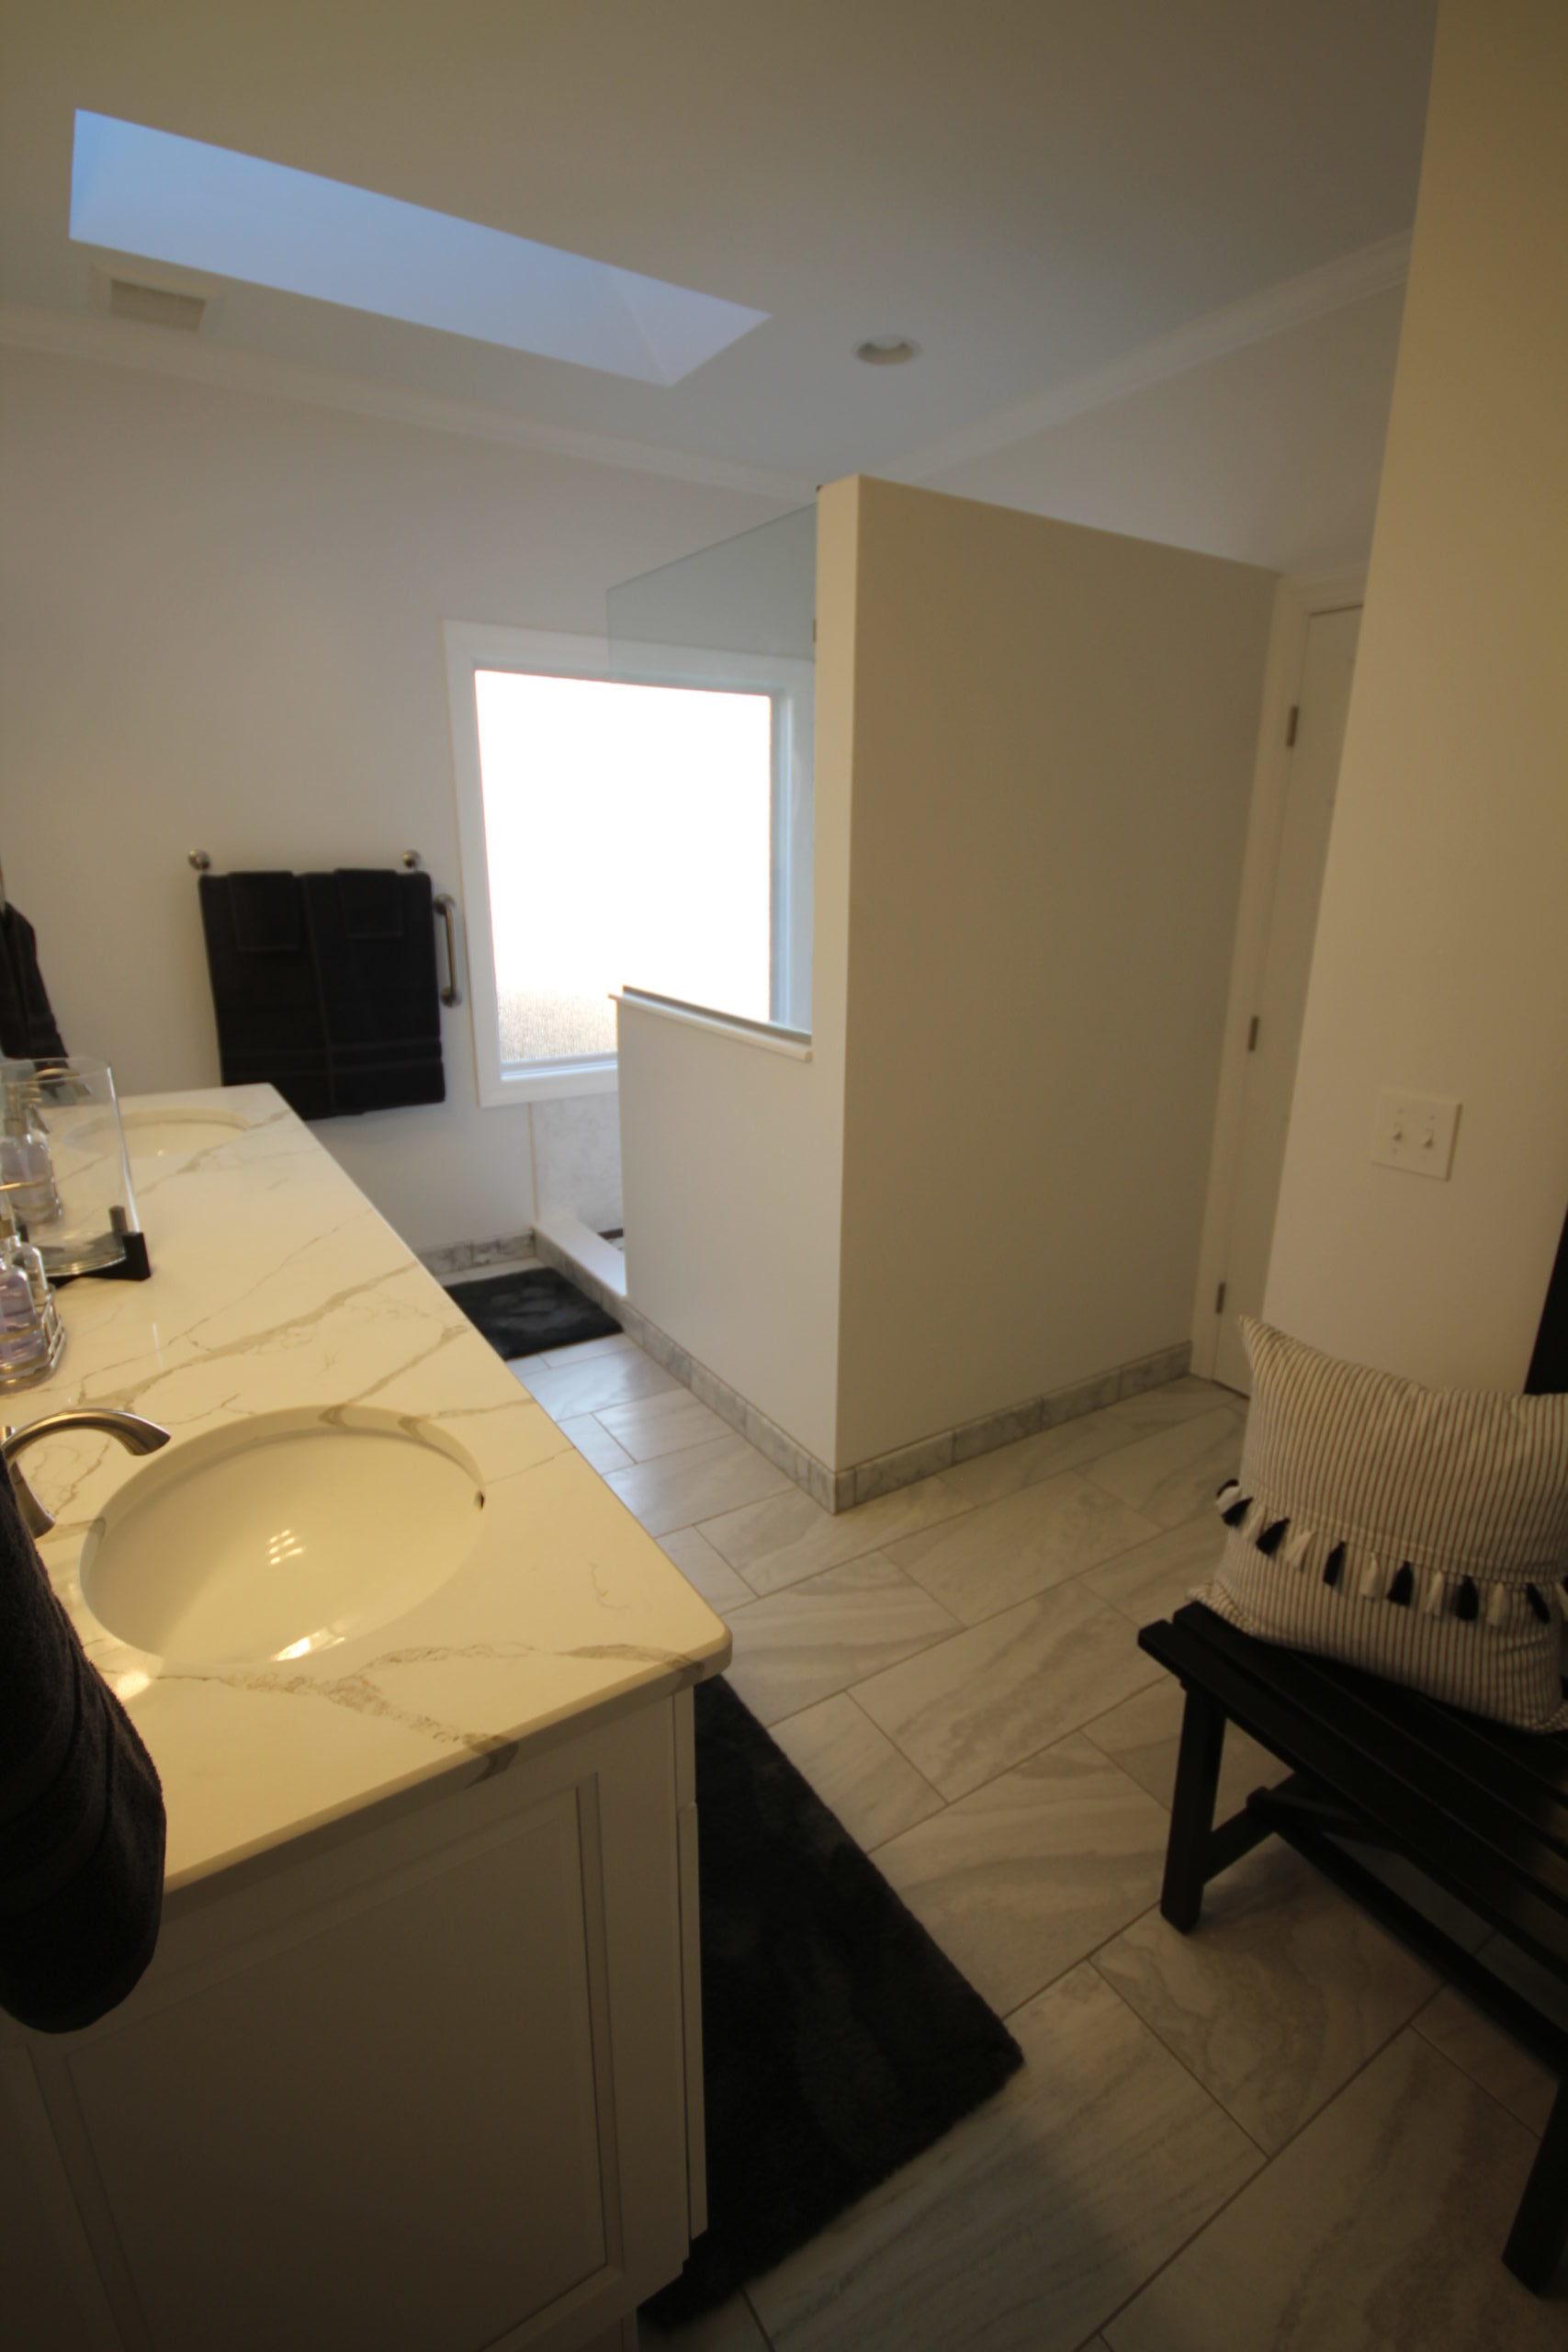 bathroom-remodeling-work-TAG-Builders-209-GV-Bathroom-Remodel-1-scaled-e1586518875395